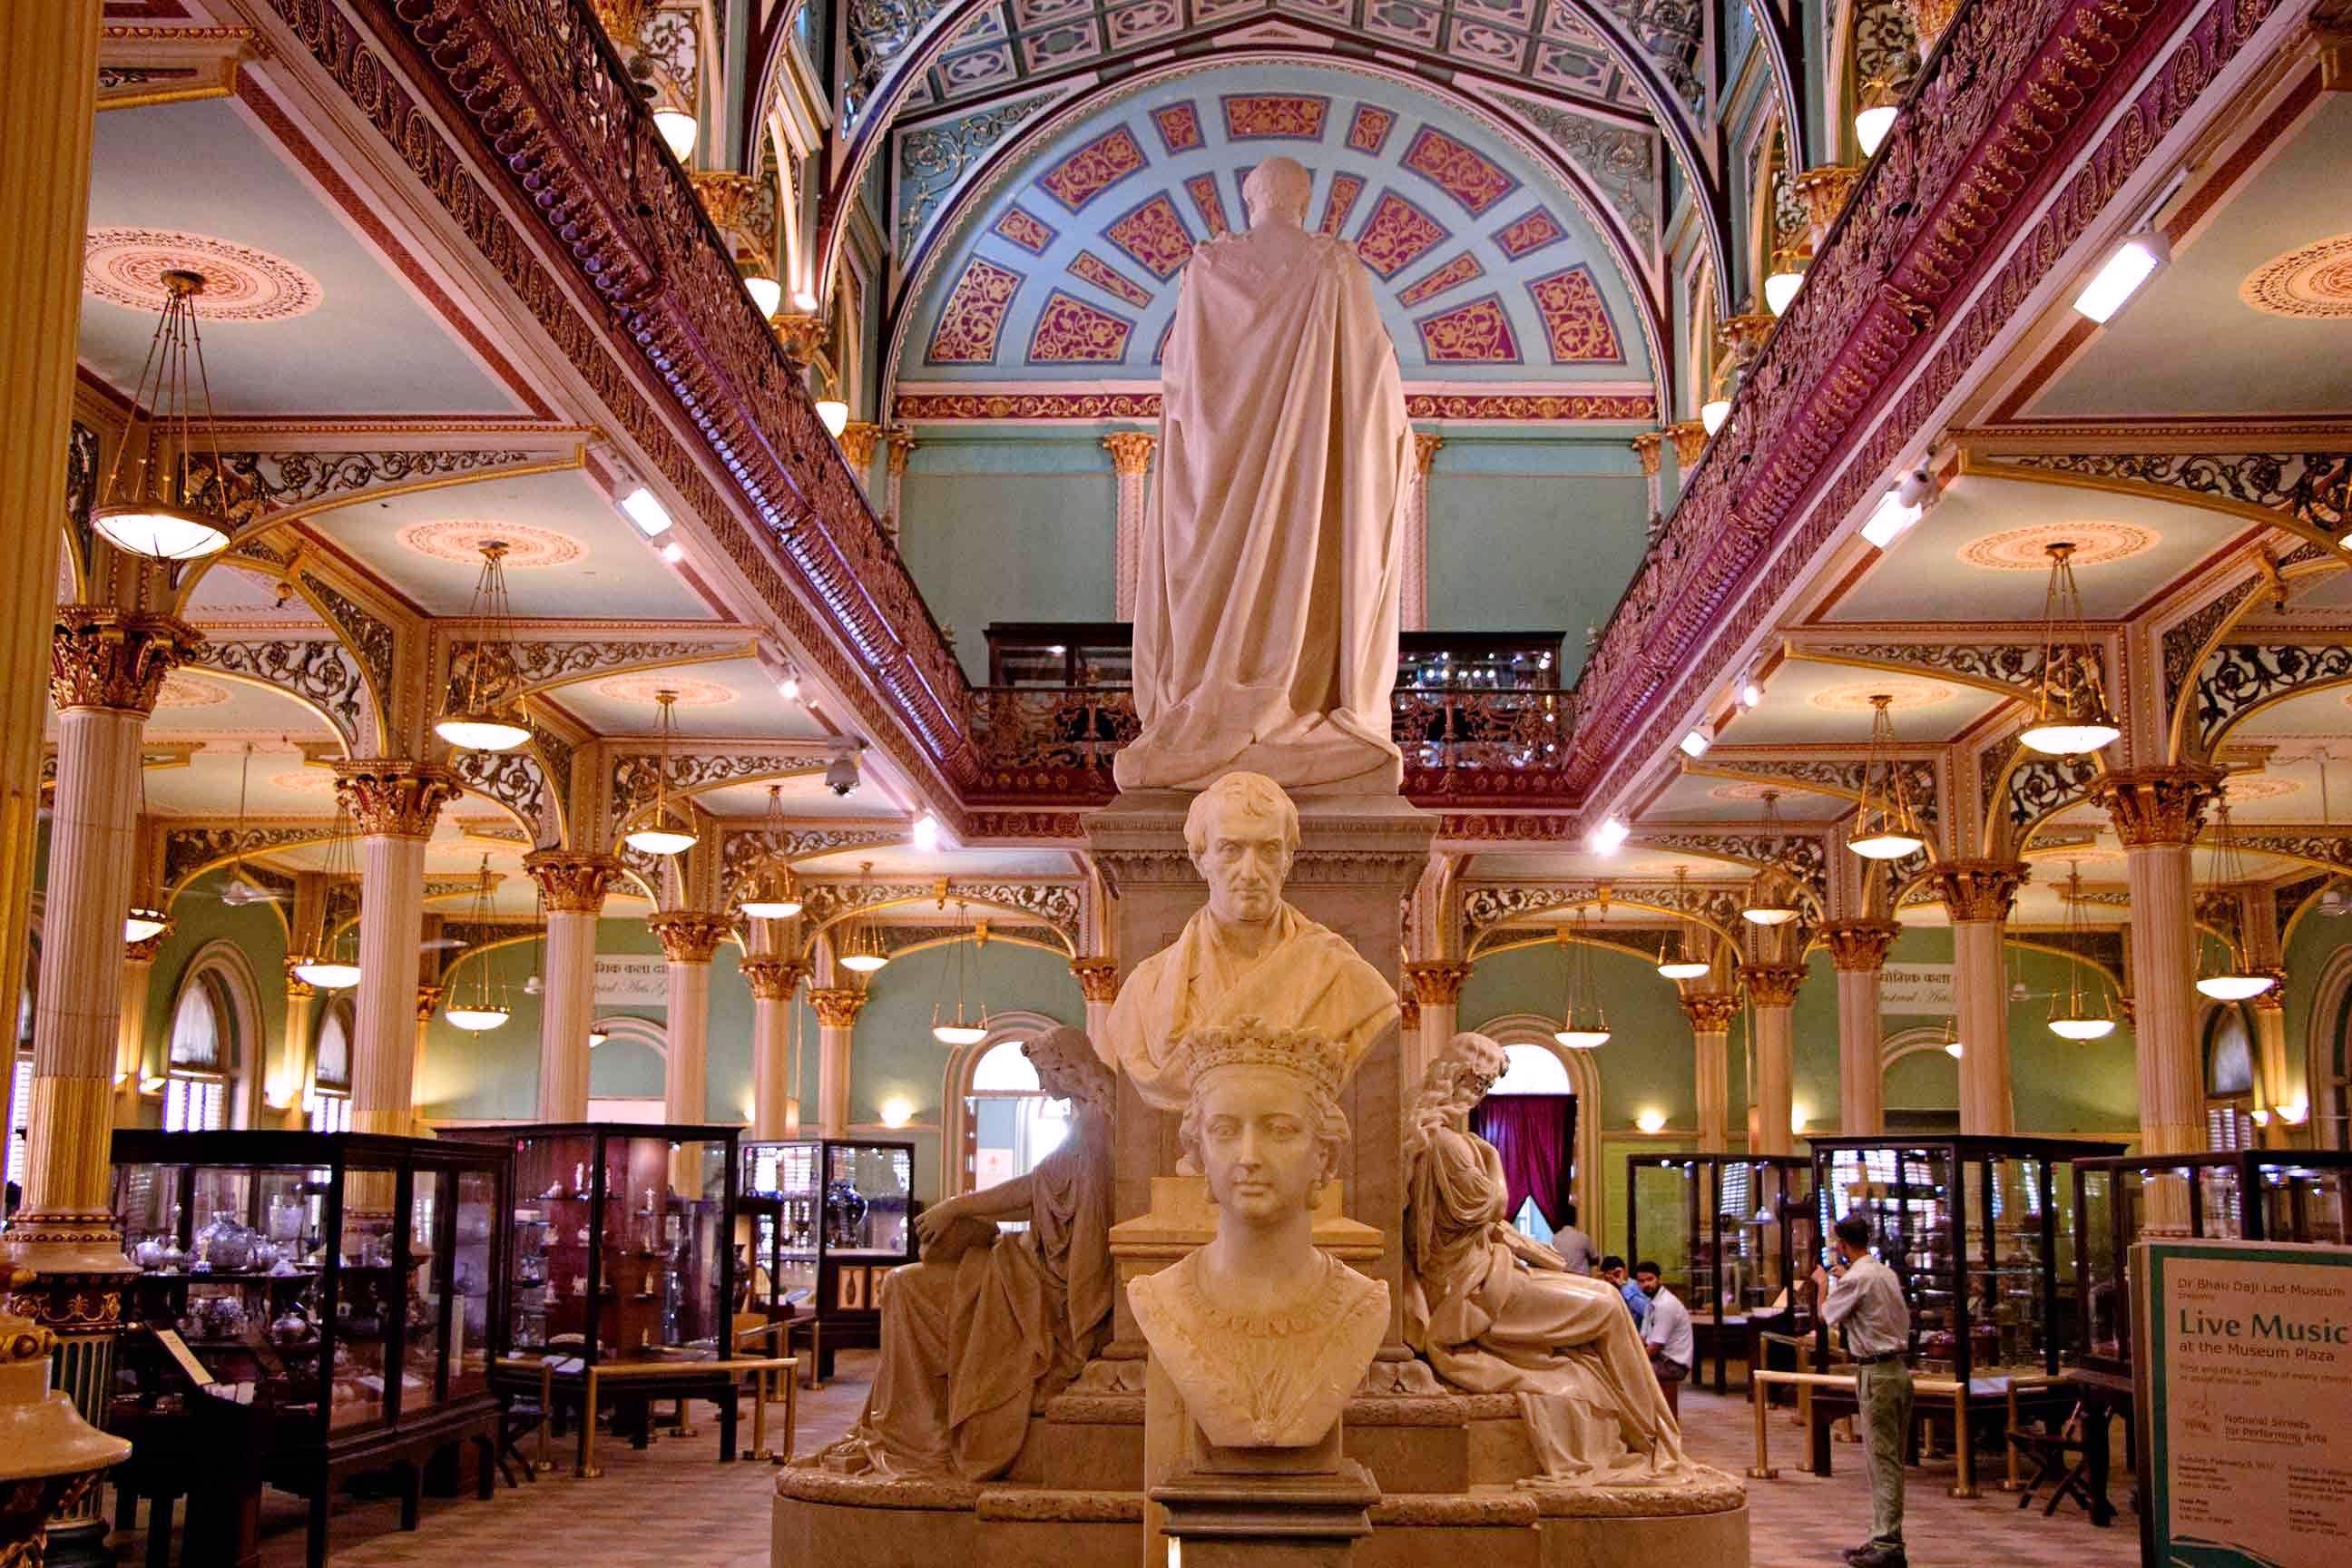 Landmark,Interior design,Lighting,Architecture,Building,Lobby,Ceiling,Statue,Symmetry,Hotel